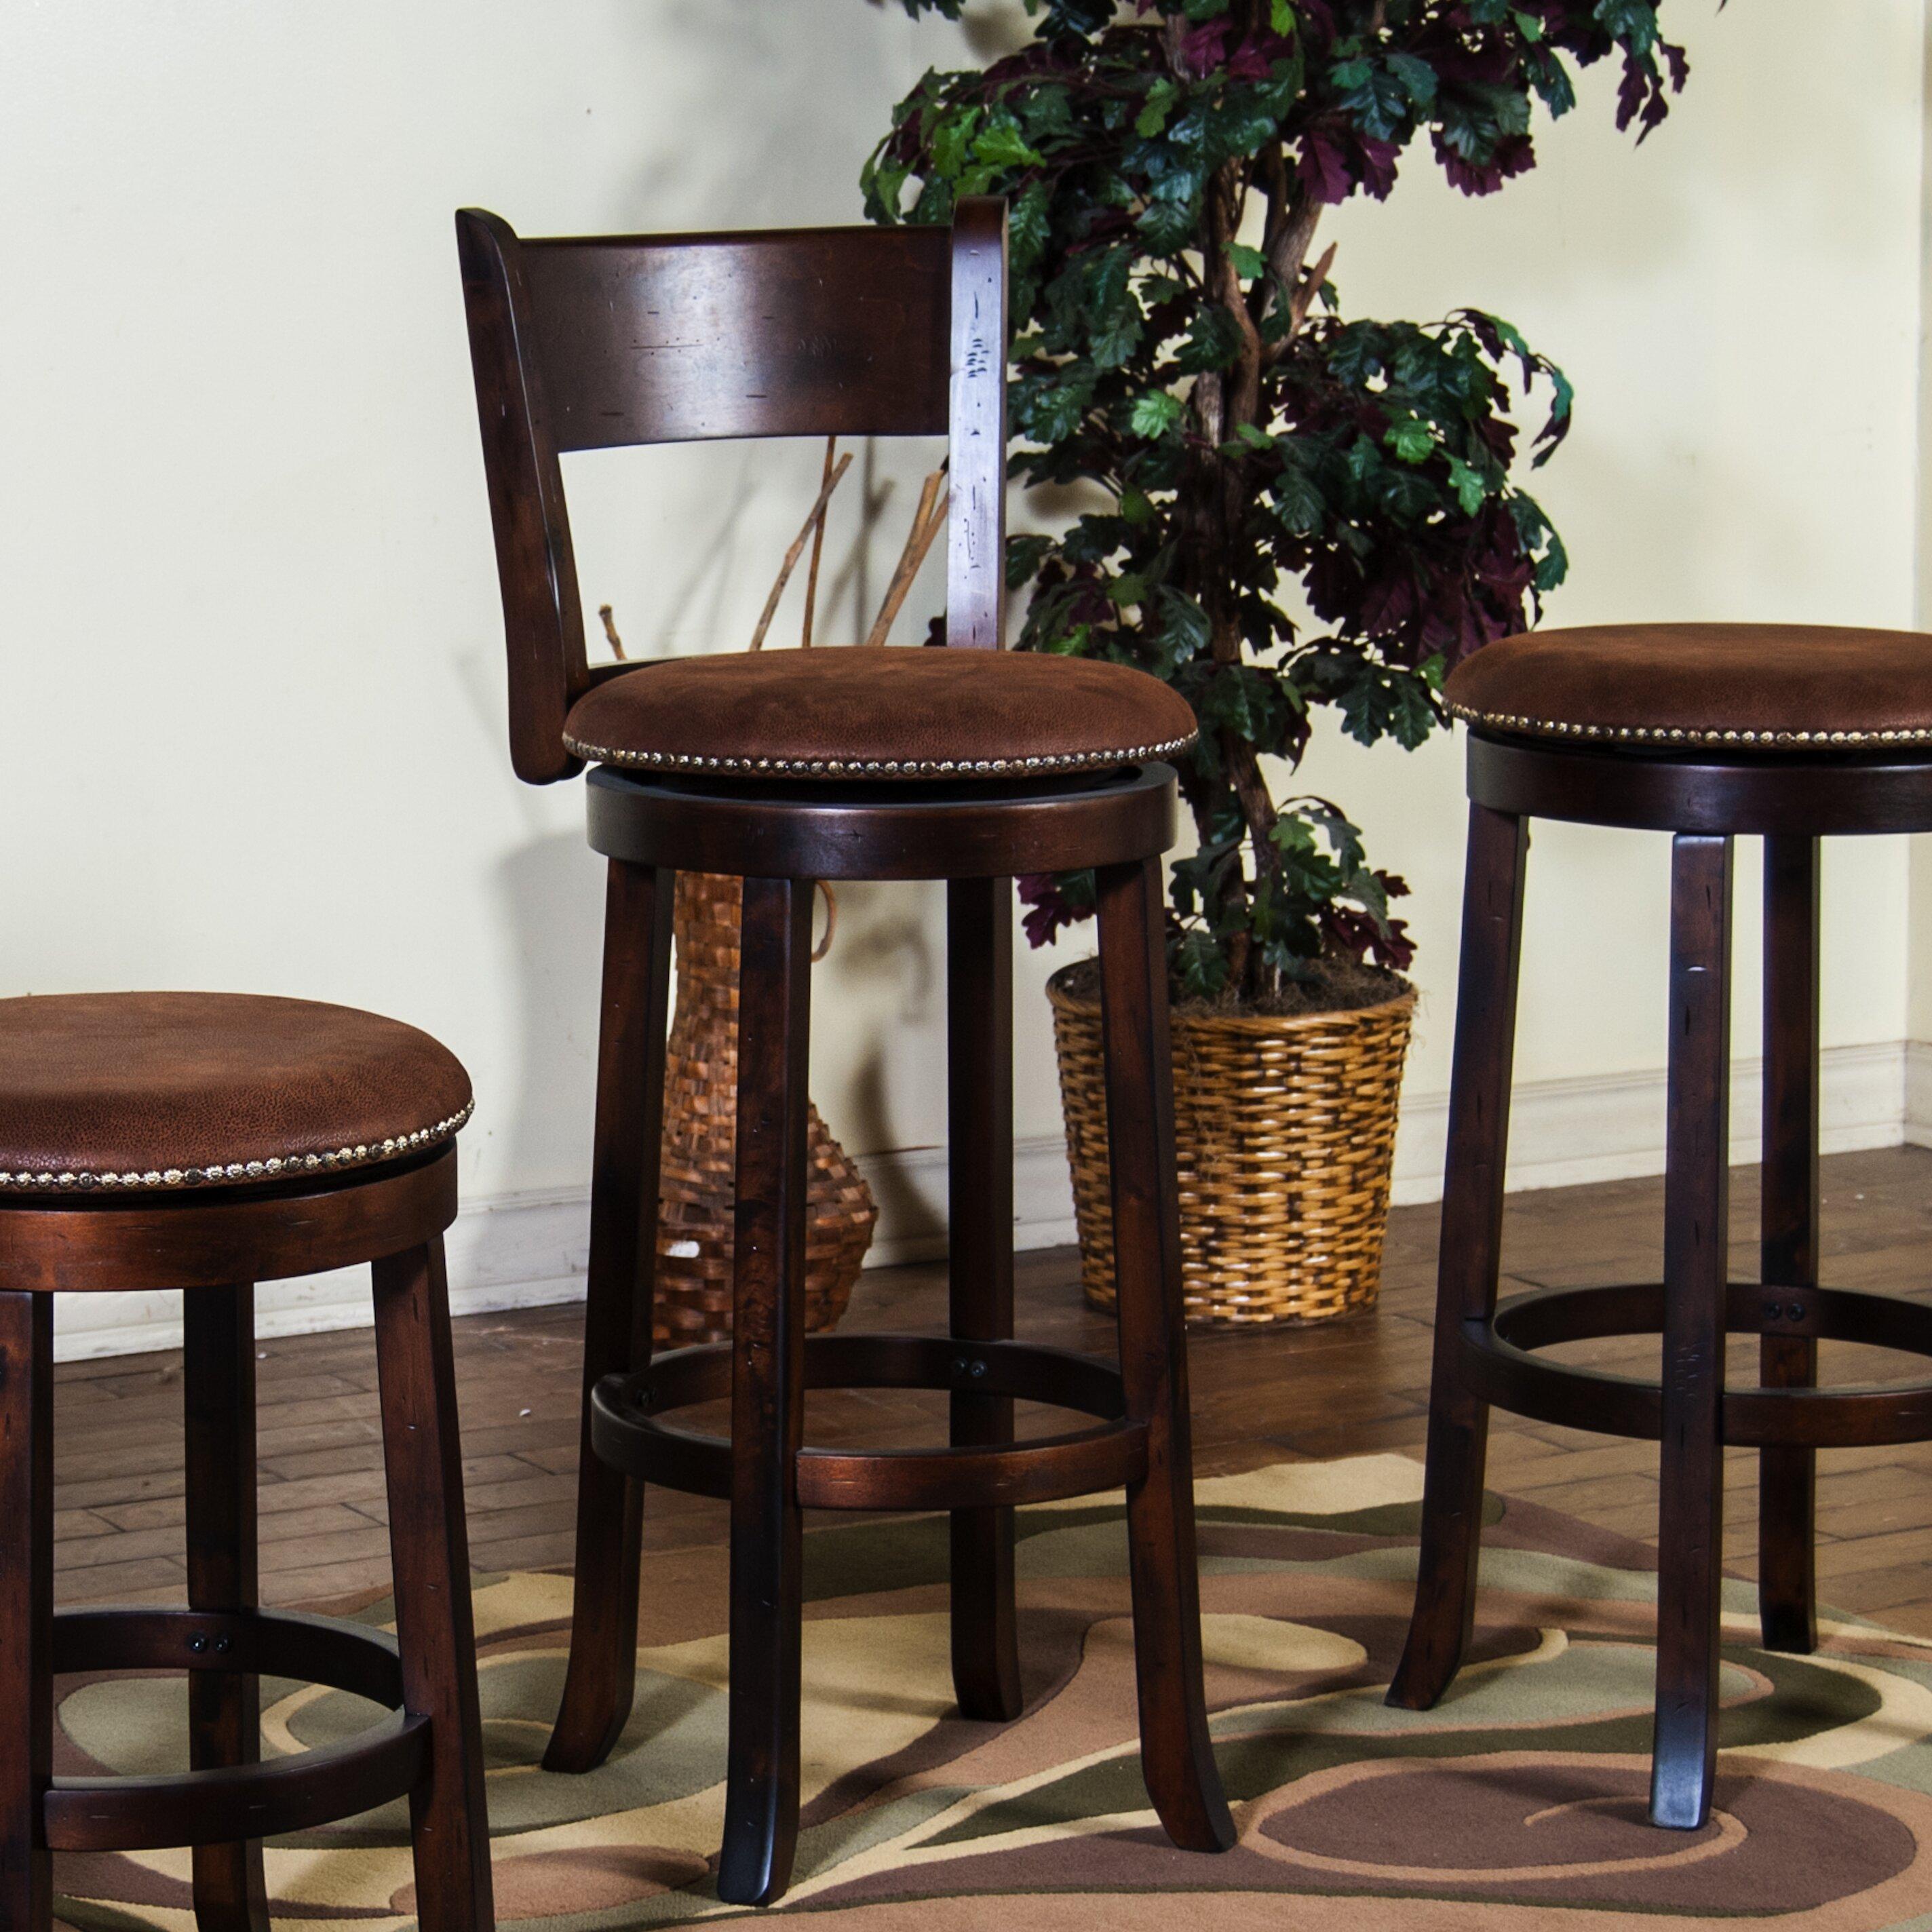 Sunny Designs Santa Fe Pub Table Set Amp Reviews Wayfair